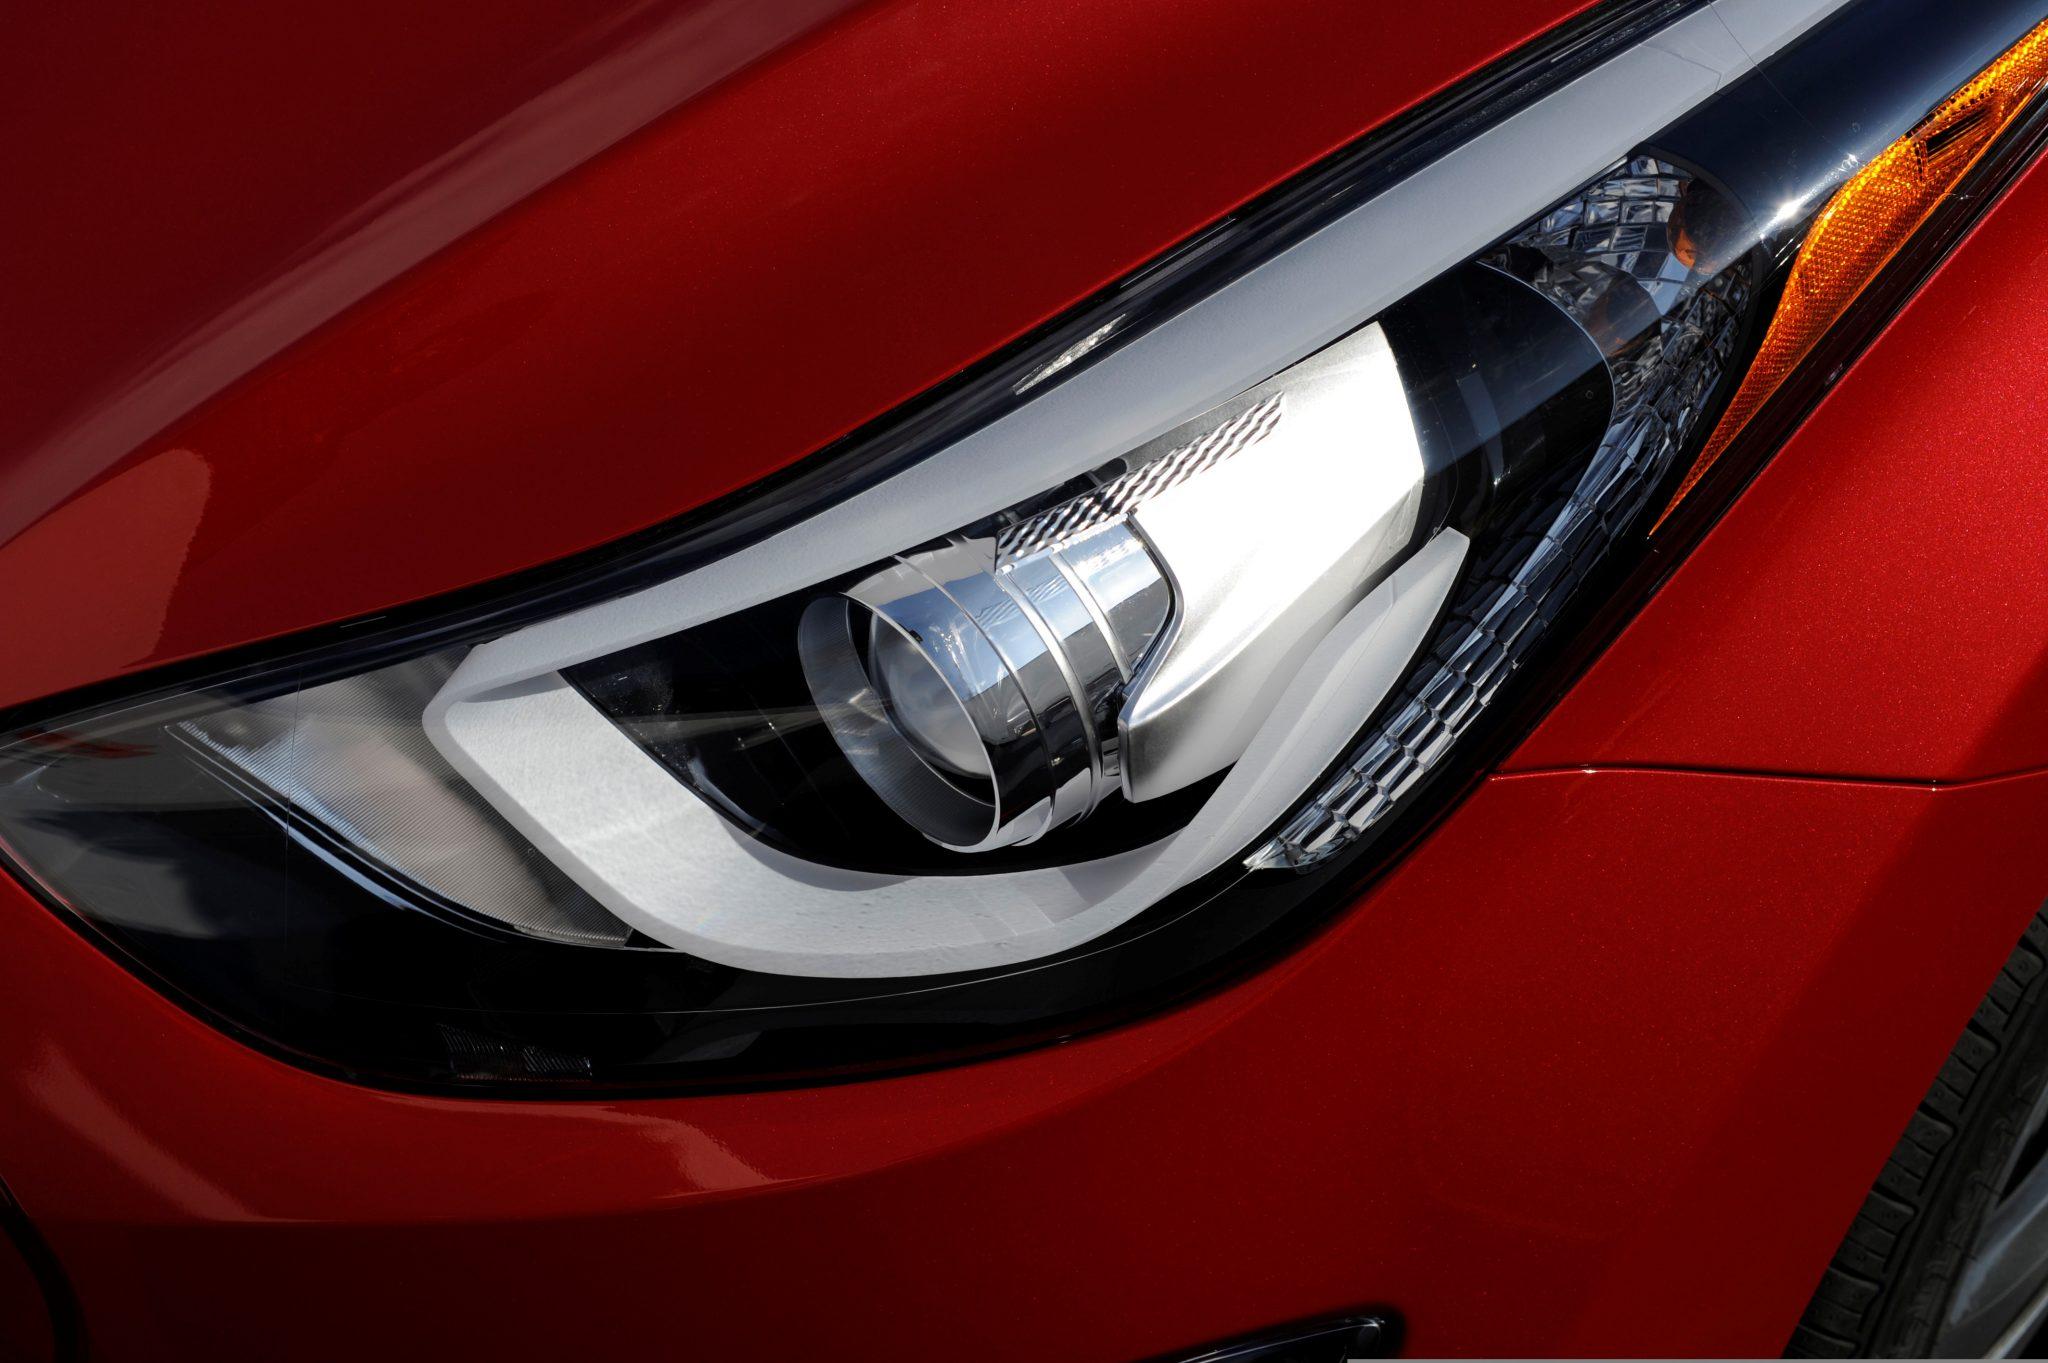 2015 Hyundai Elantra Updates Announced The News Wheel